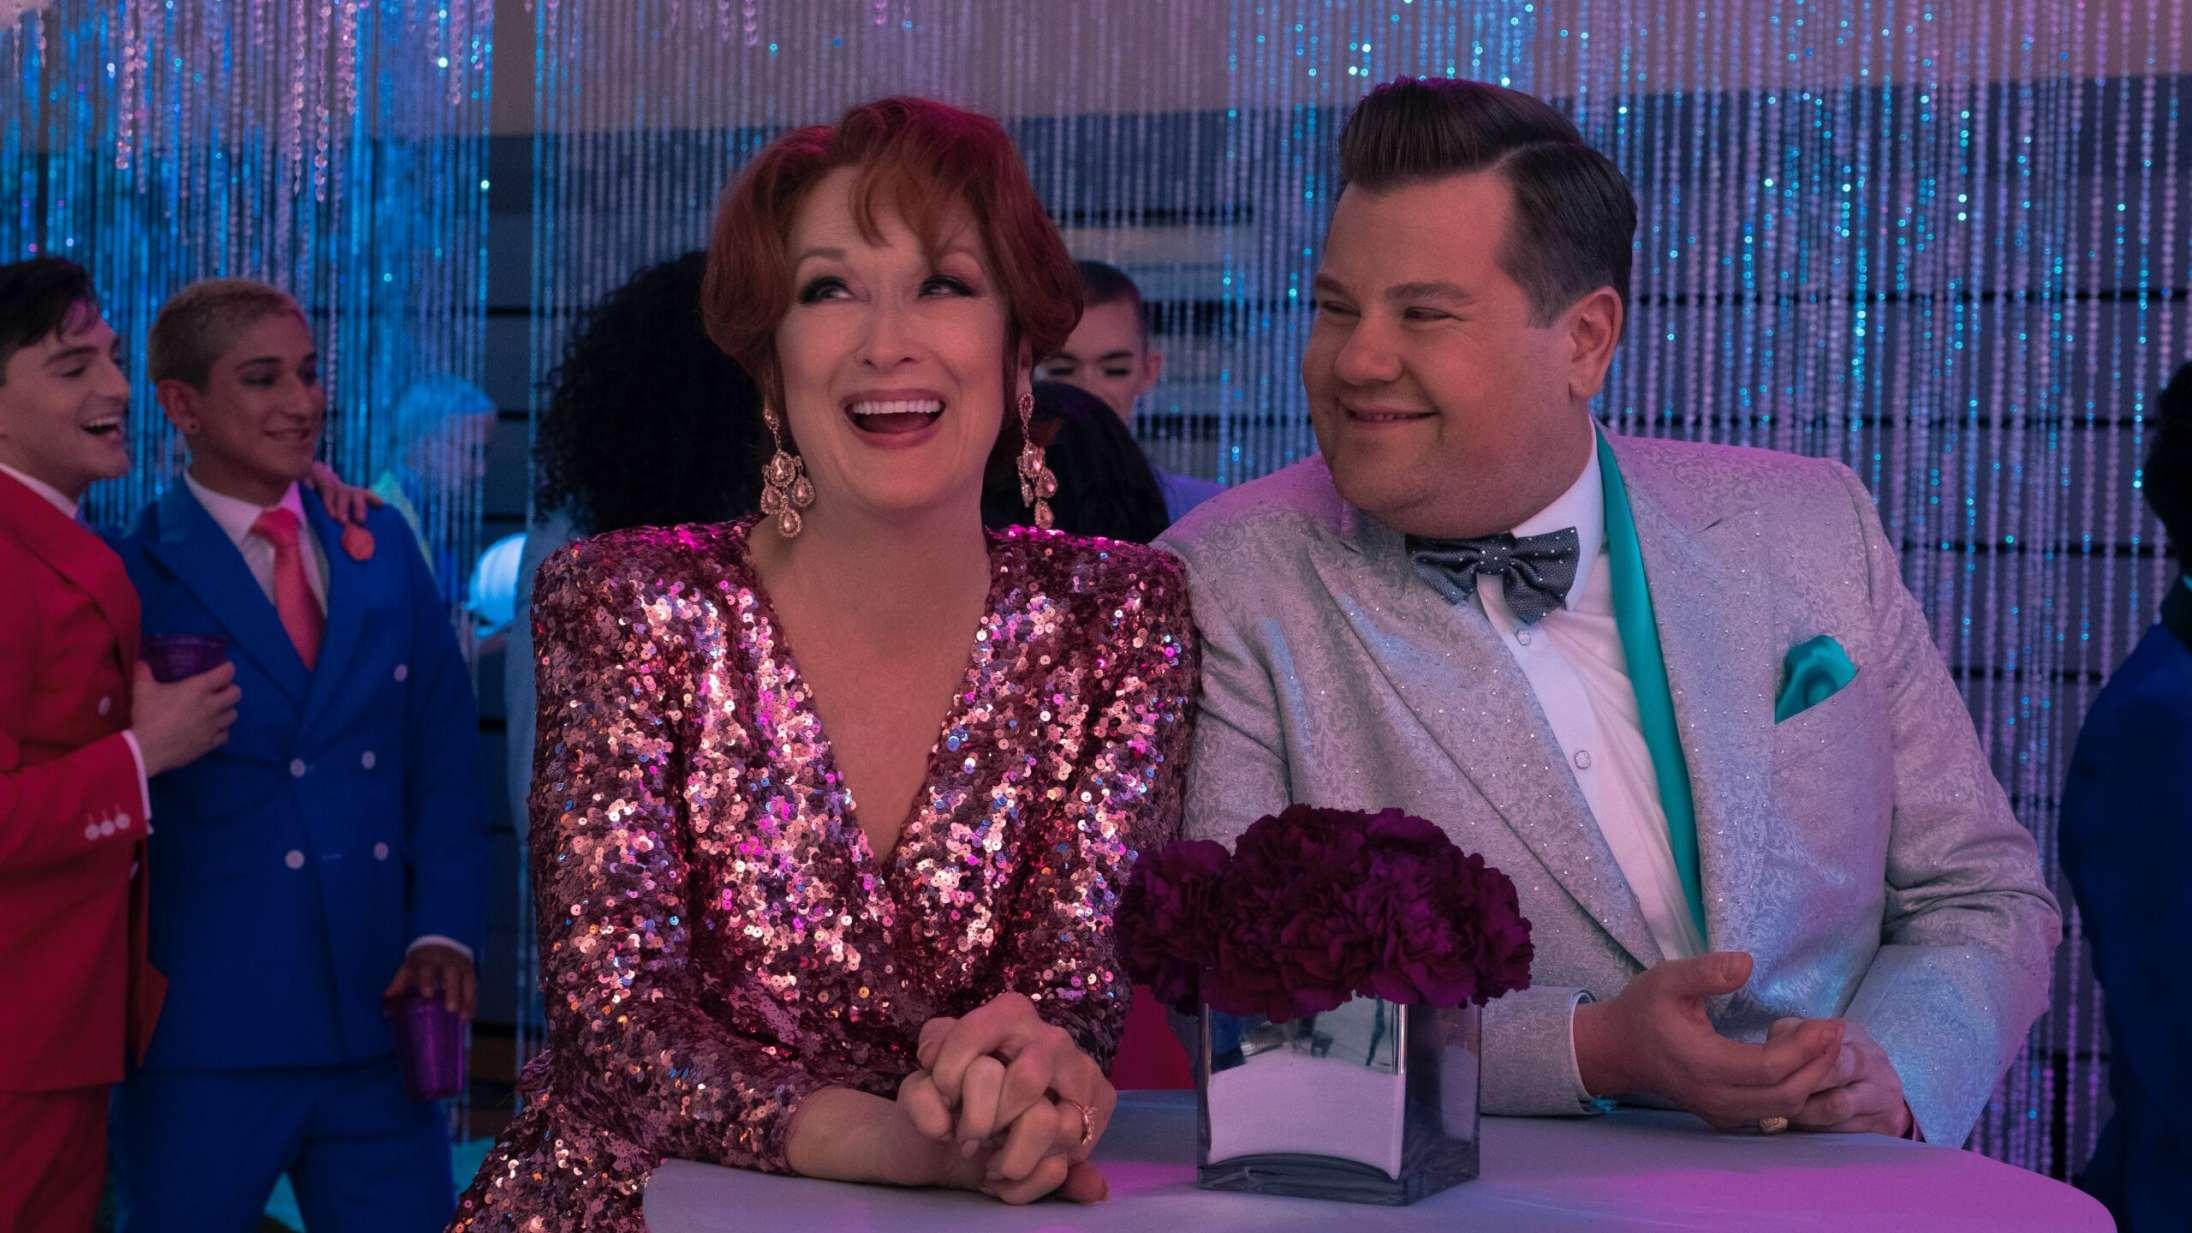 'The Prom': Ryan Murphys stjernespækkede Netflix-musical er oppustet og et musikalsk fejltrin